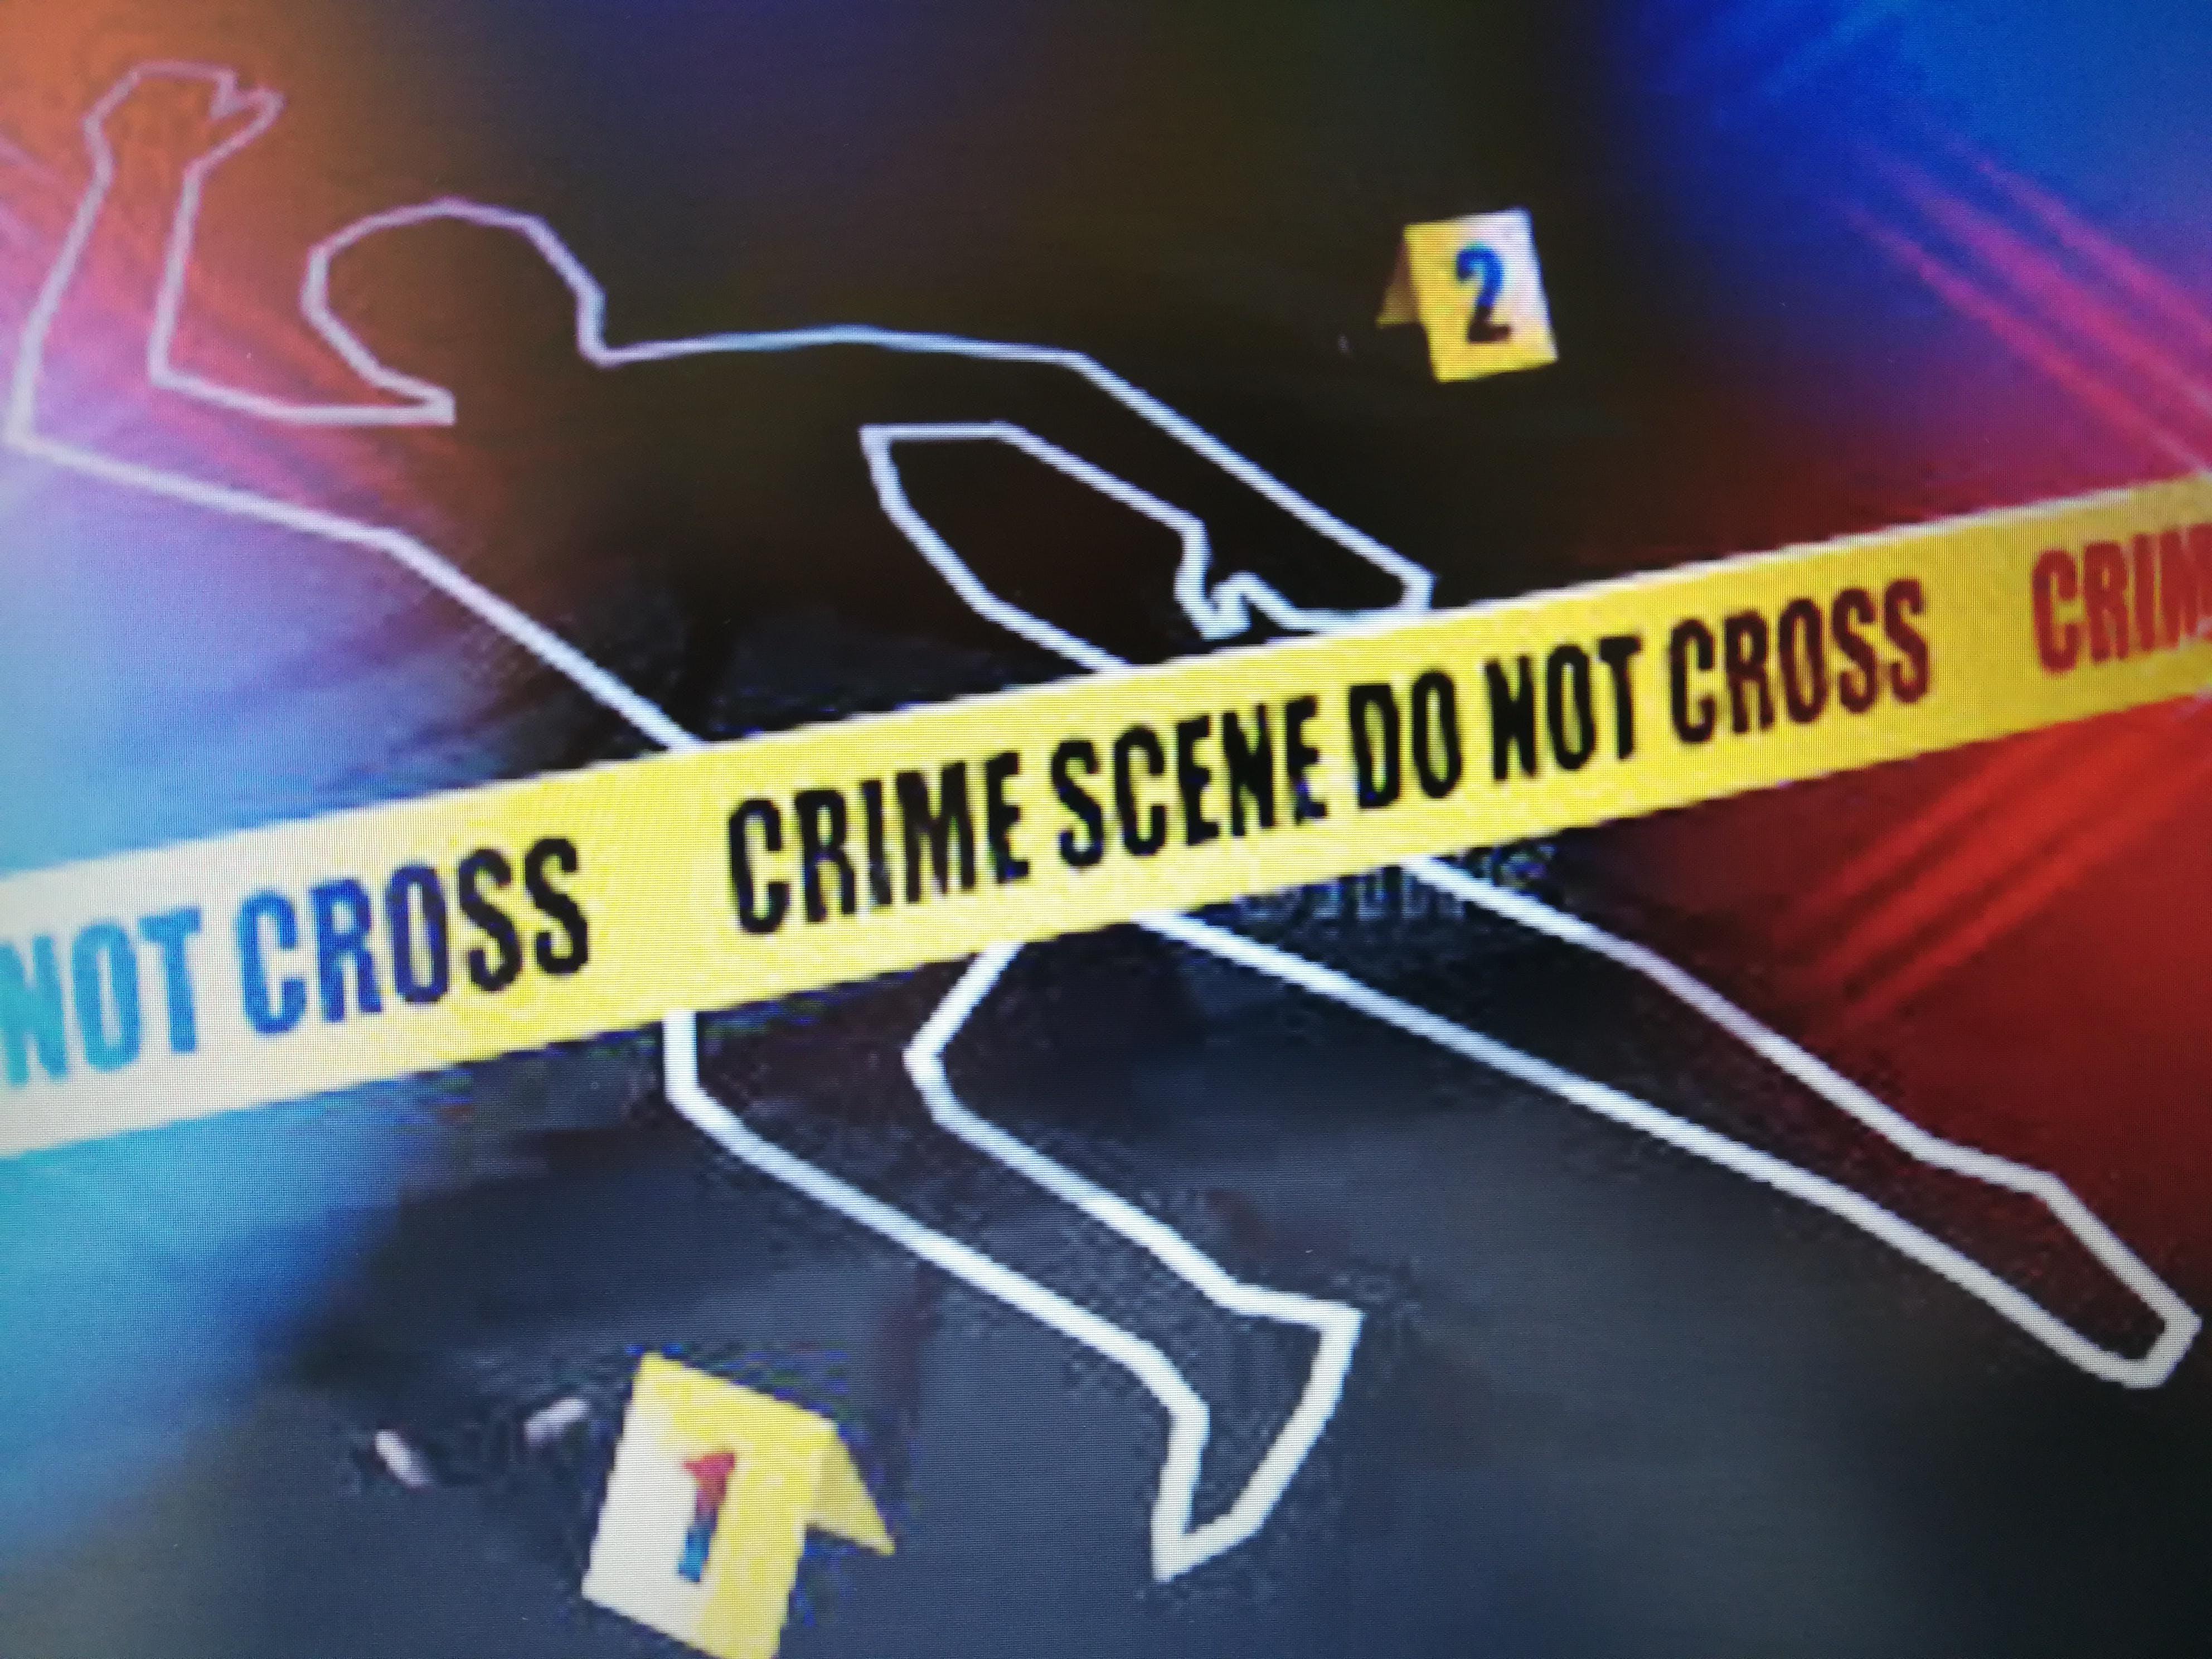 Murder Mystery Escape Room - Sun 23rd Sept 12